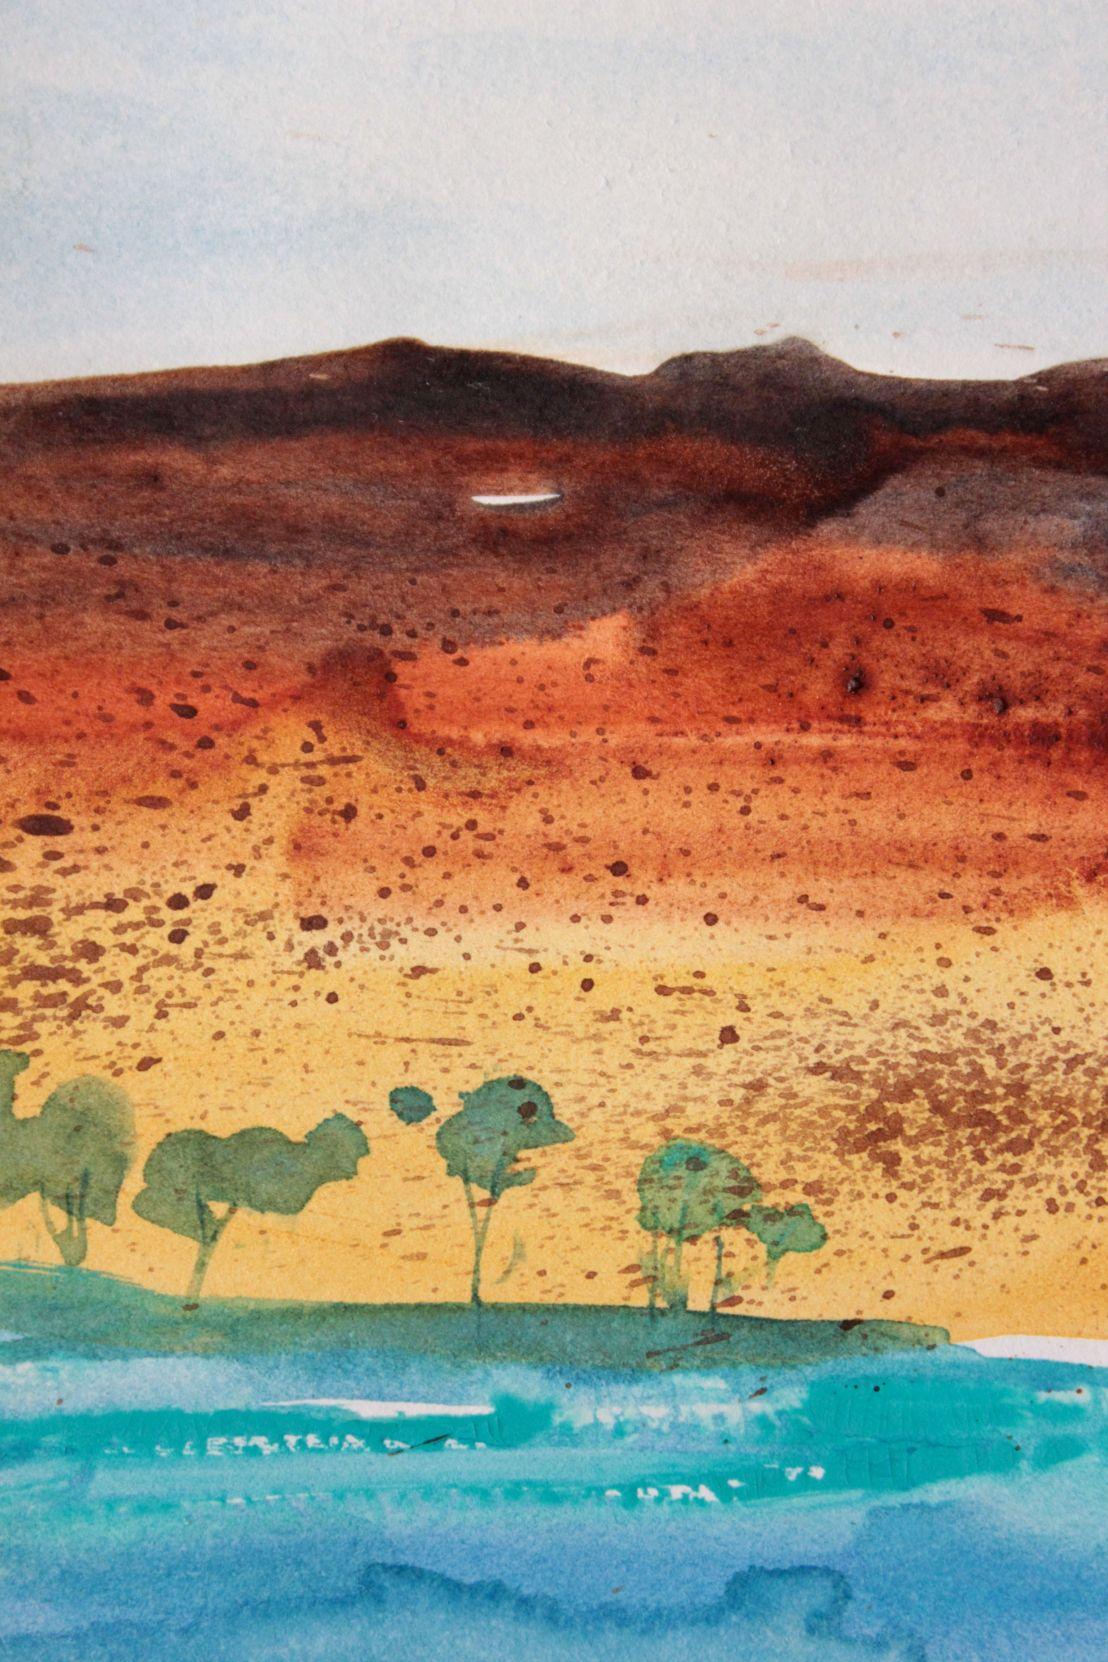 Painting Impressionistic Landscapes